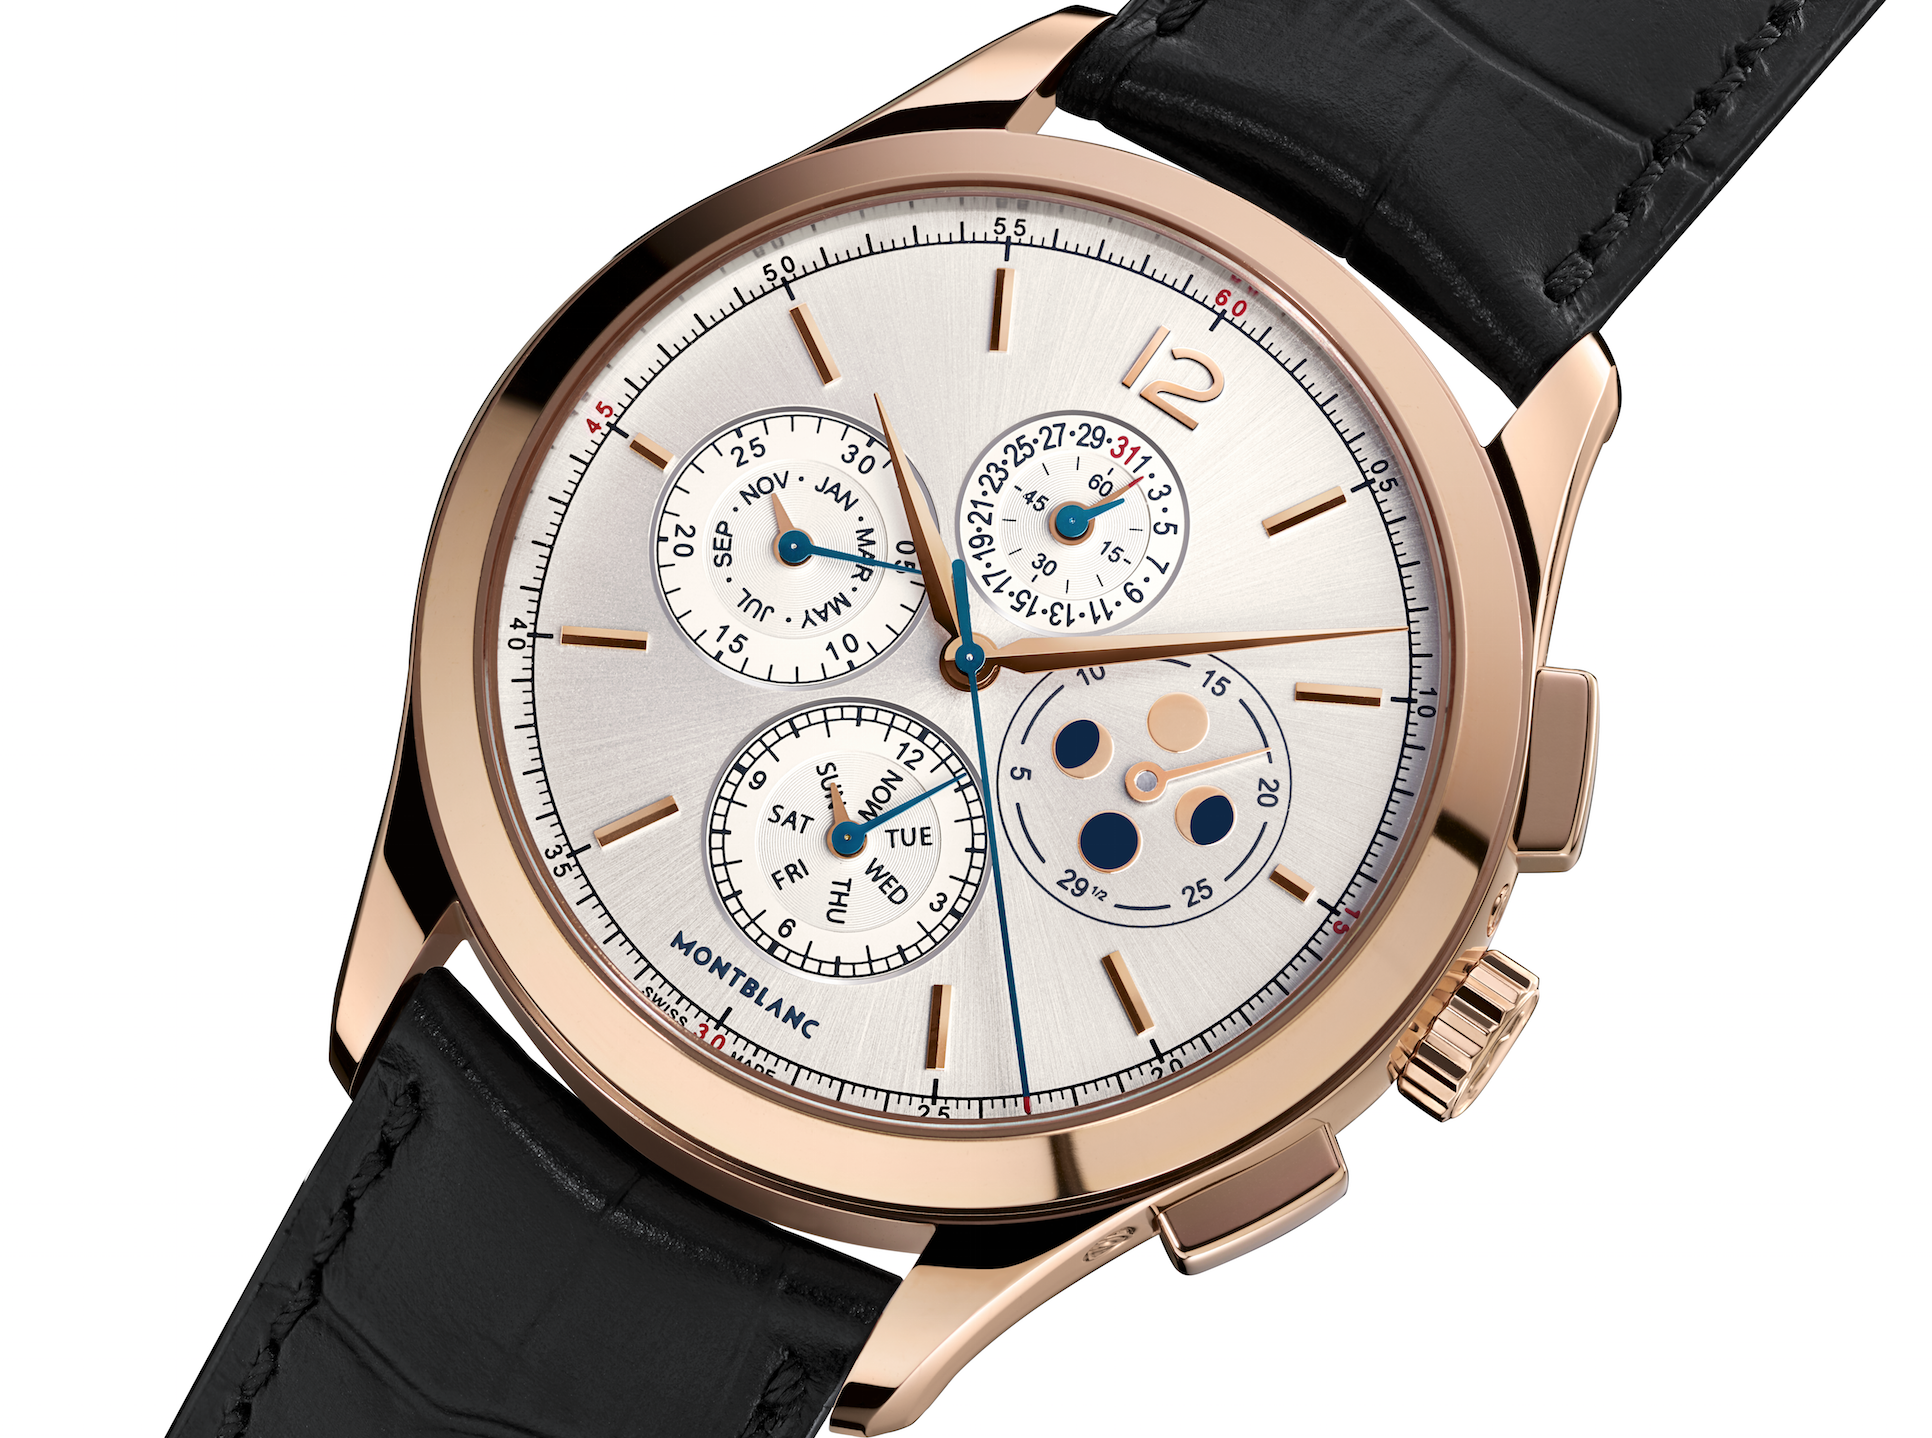 Montblanc-Heritage-Chronometrie-Quantieme-Annuel-4